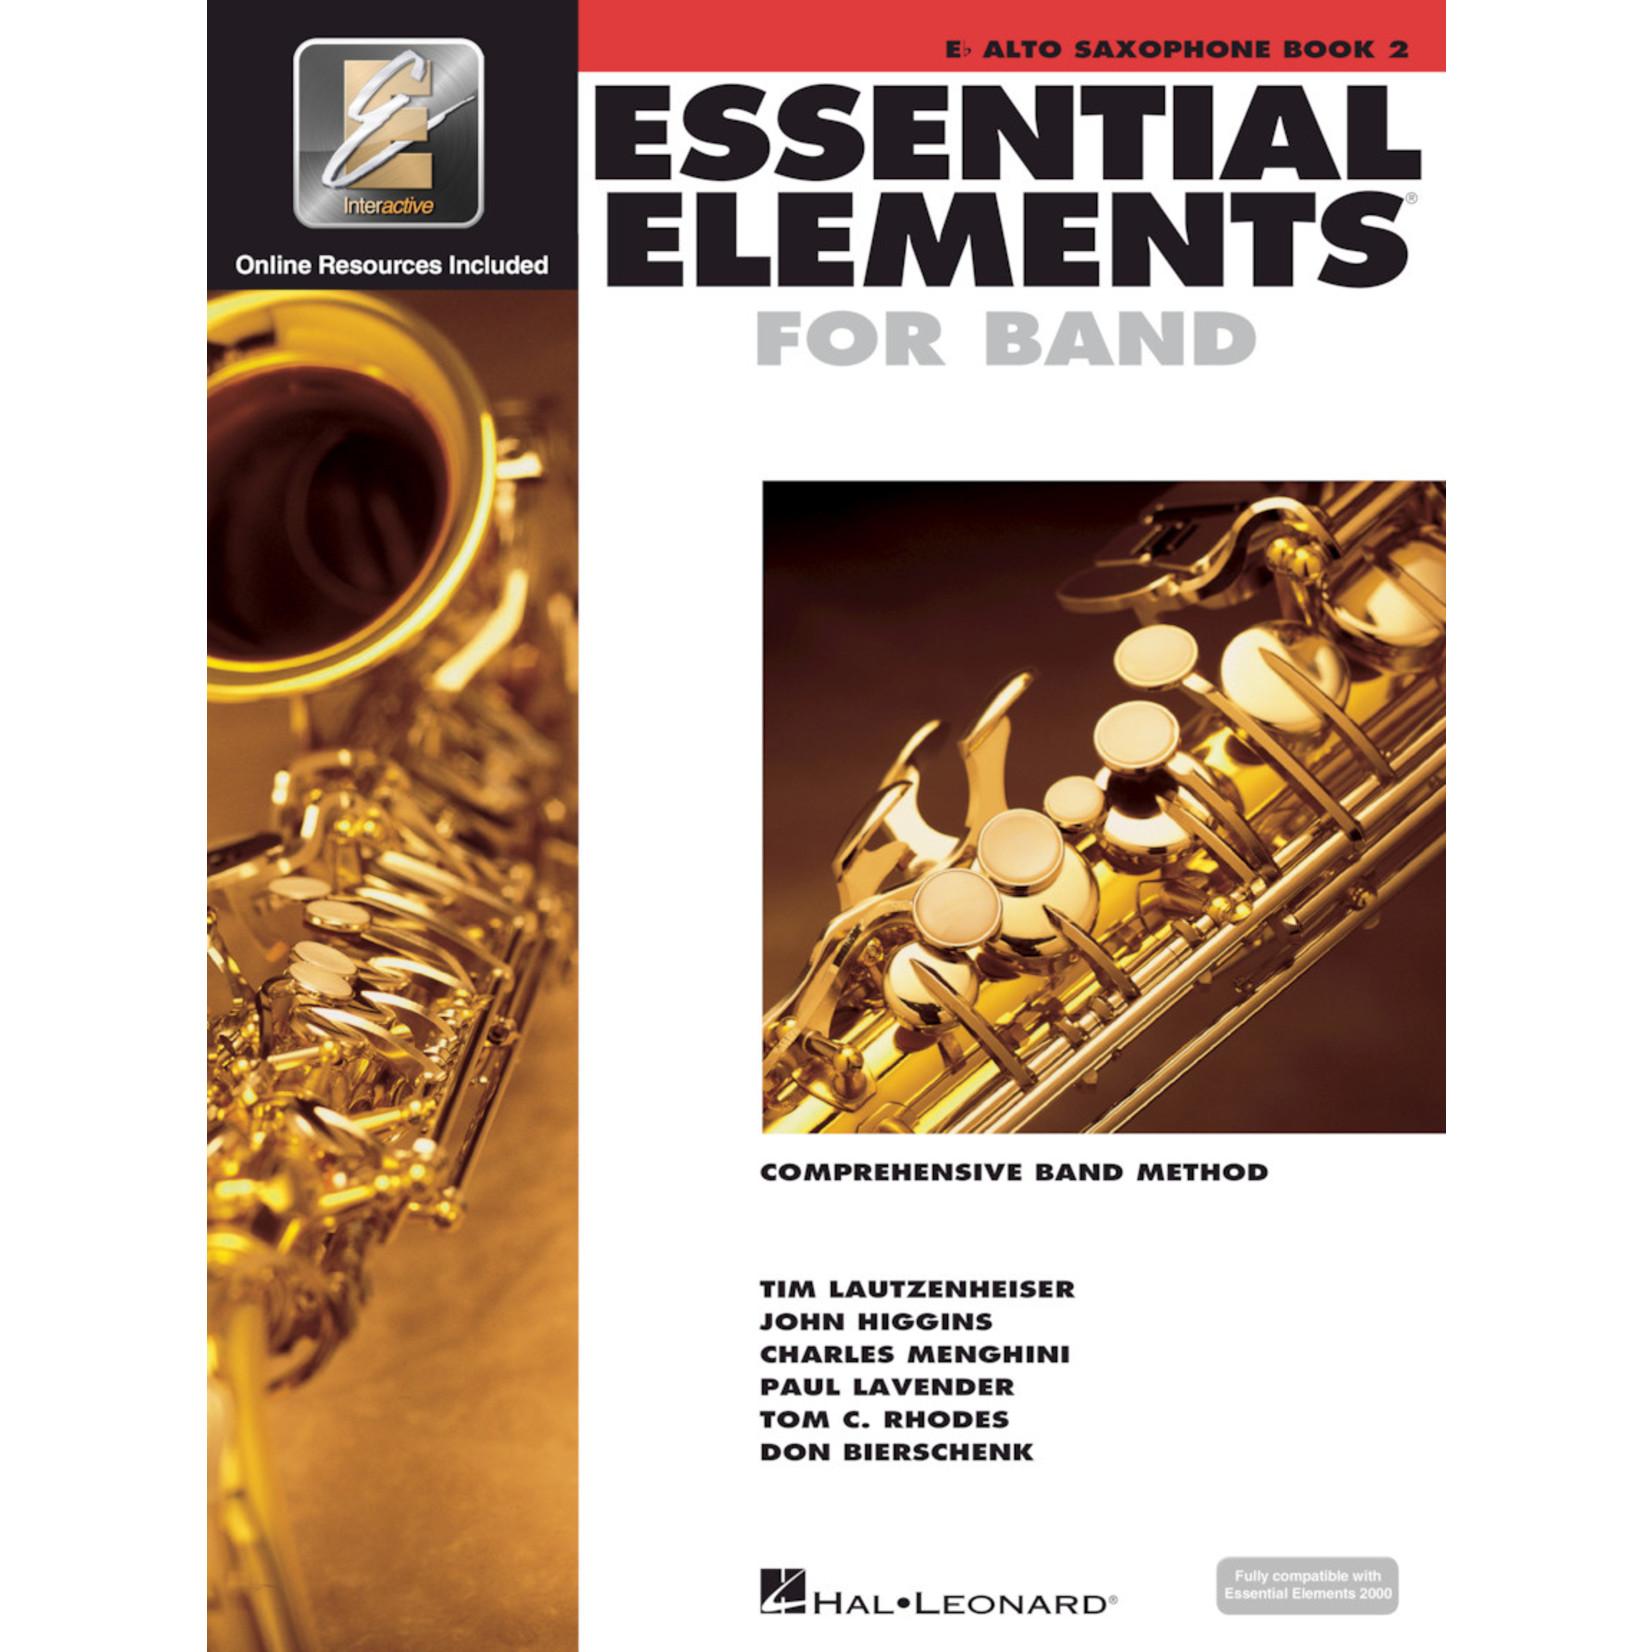 Hal Leonard Essential Elements for Band Alto Saxophone Book 2